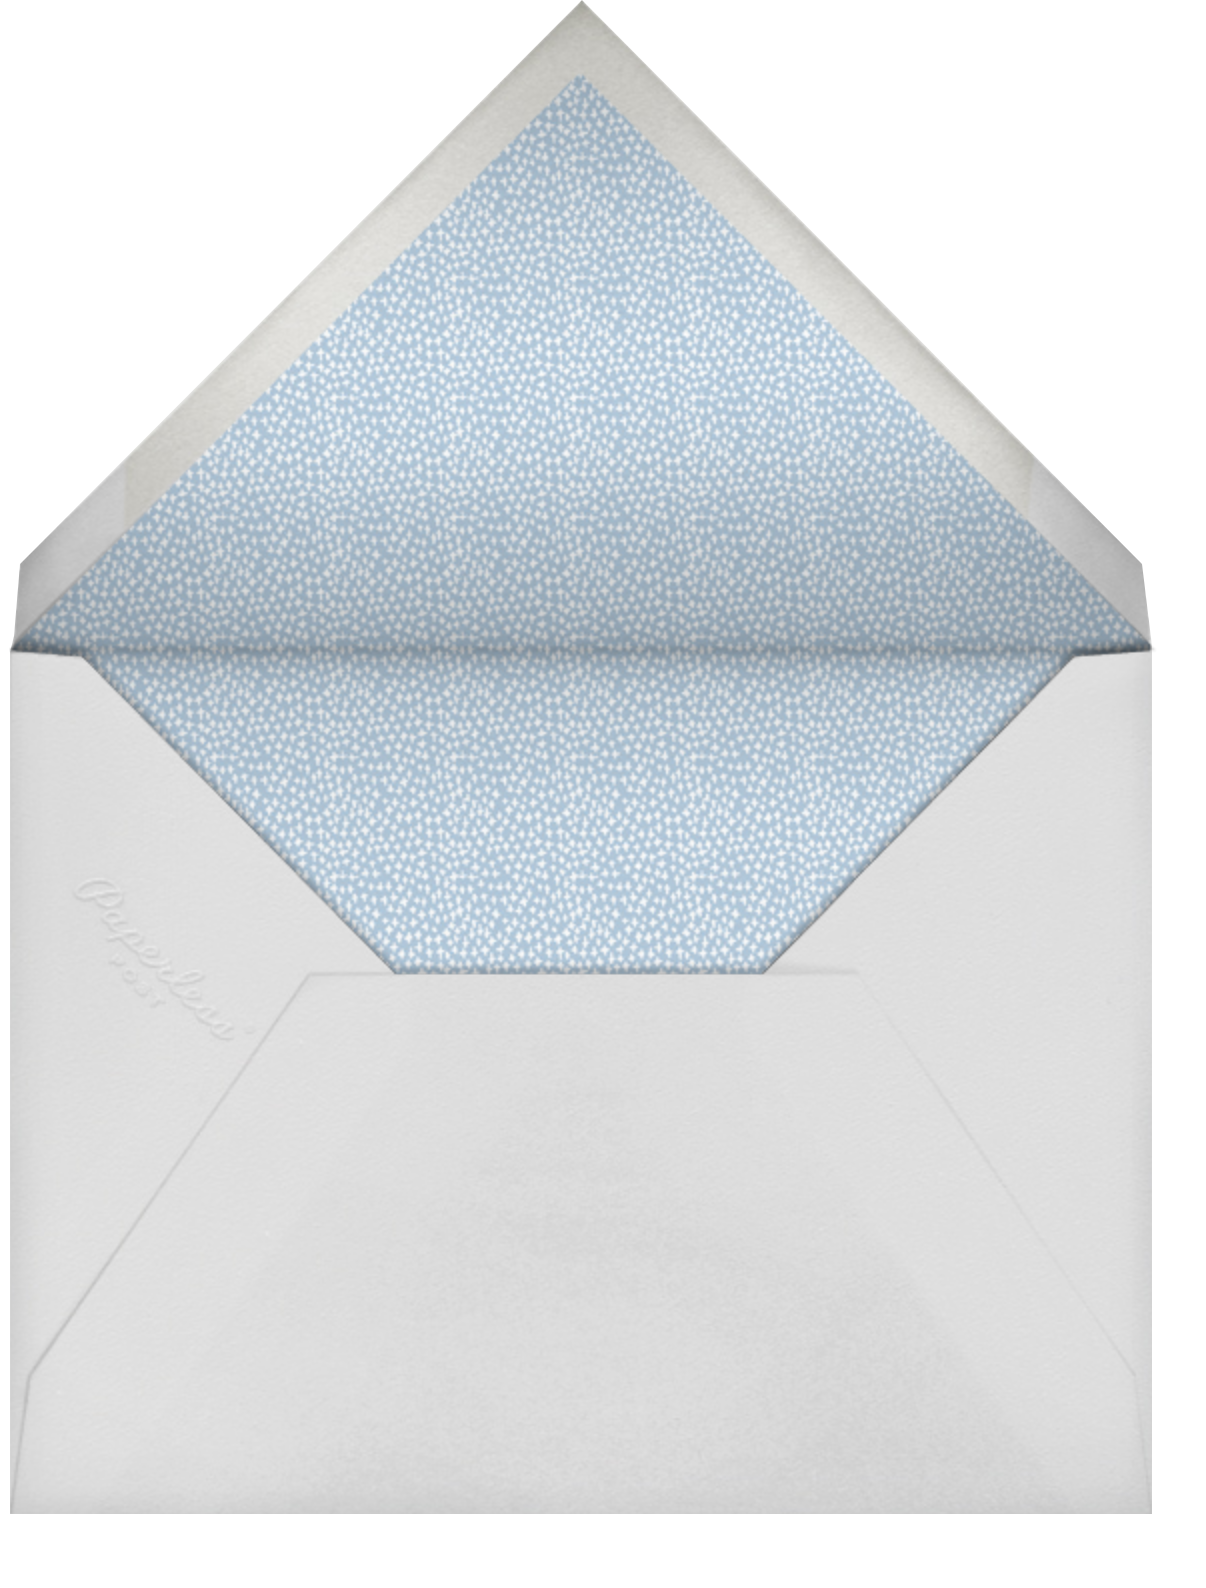 Among the Daisies - Tundra - Mr. Boddington's Studio - Envelope